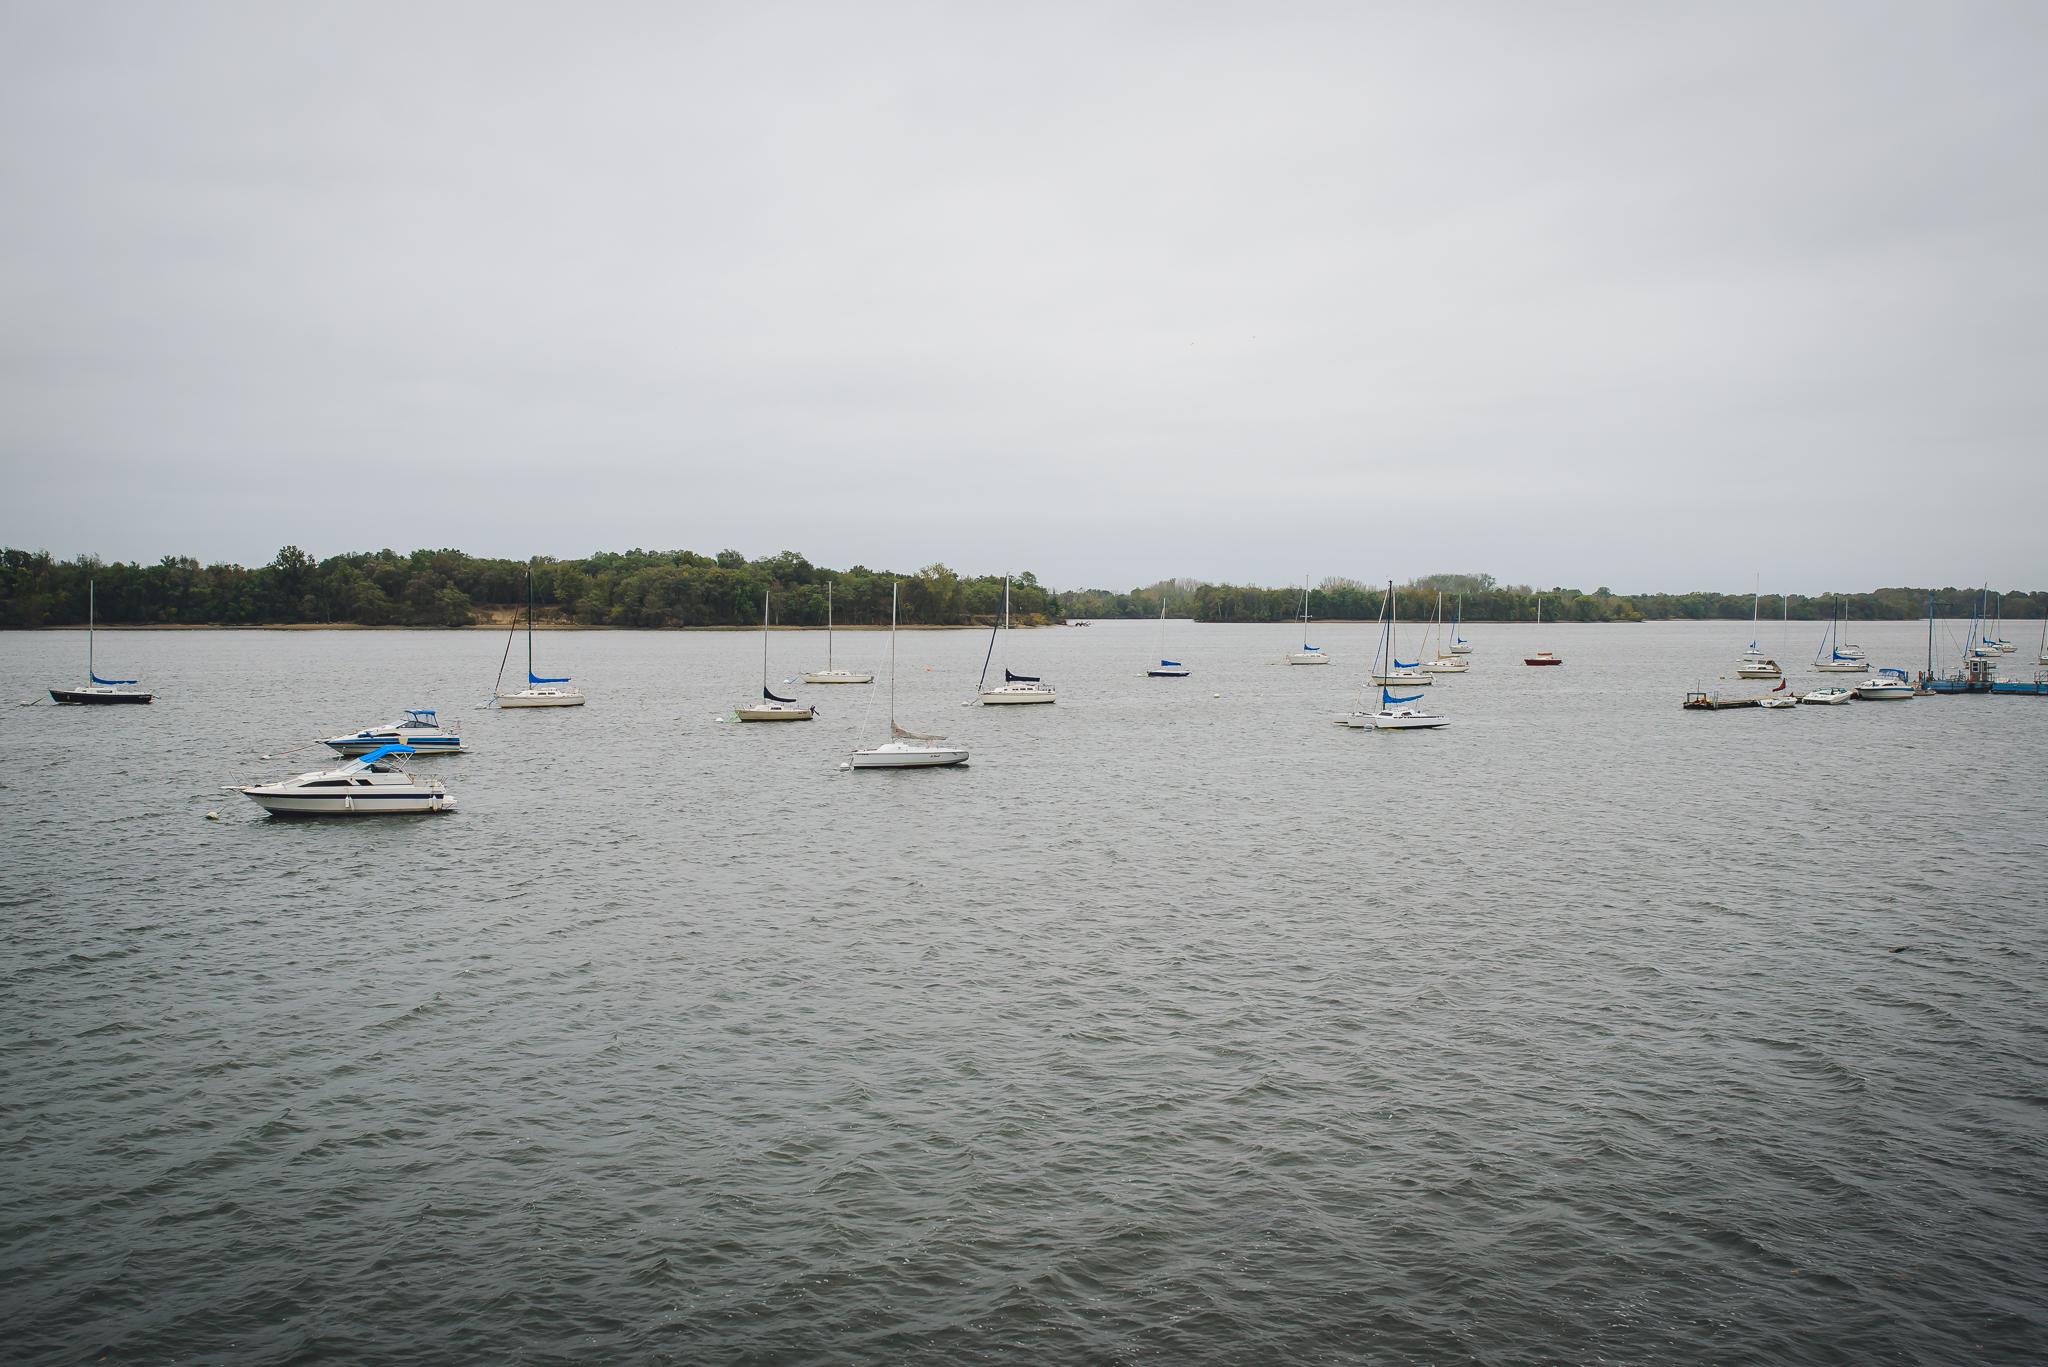 Glen-Foerd-On-the-Delaware